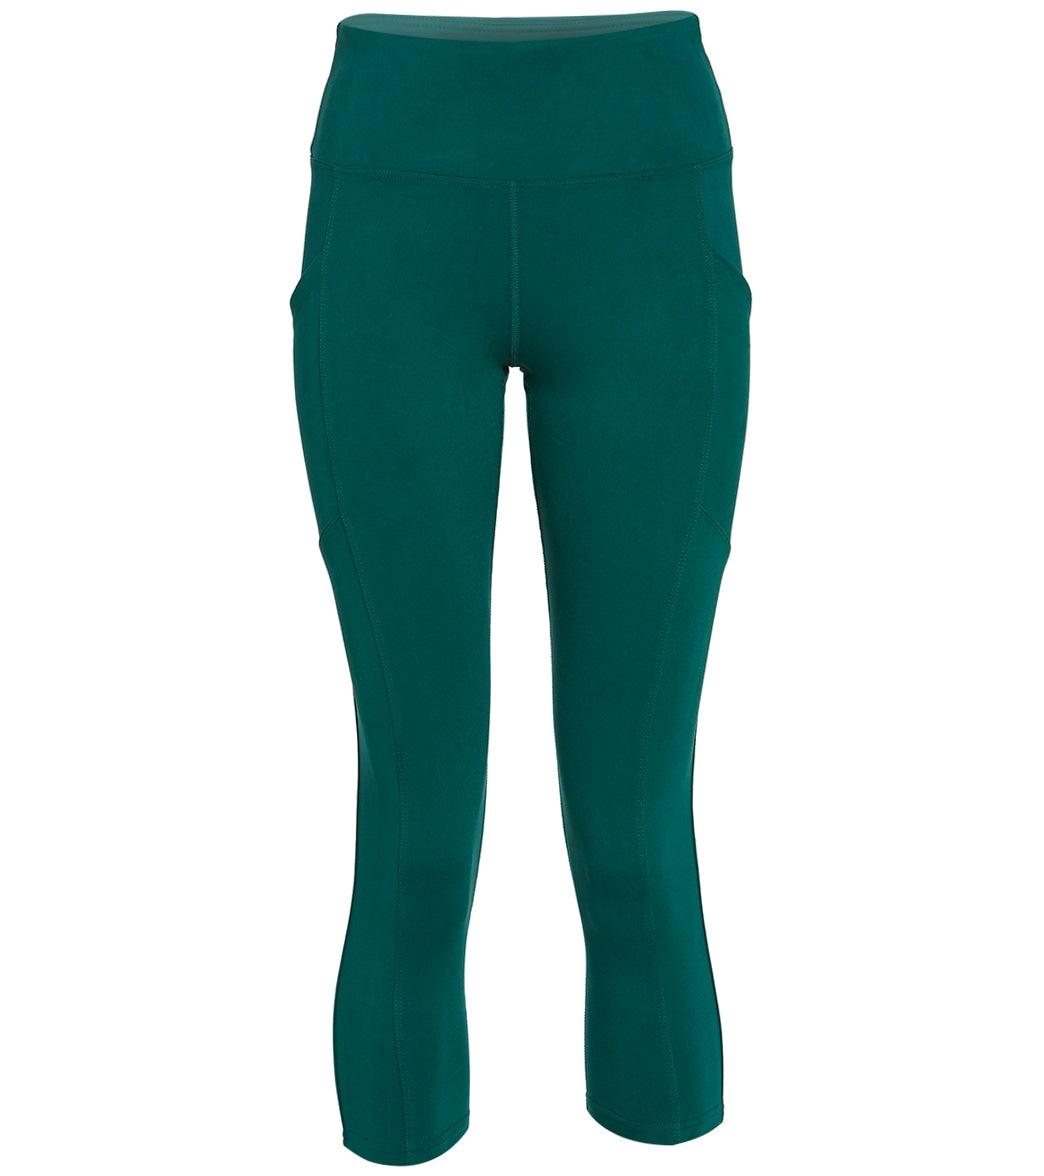 Balance Collection Women's Eclipse Yoga Capri Pants - Botanical Garden Large Cotton